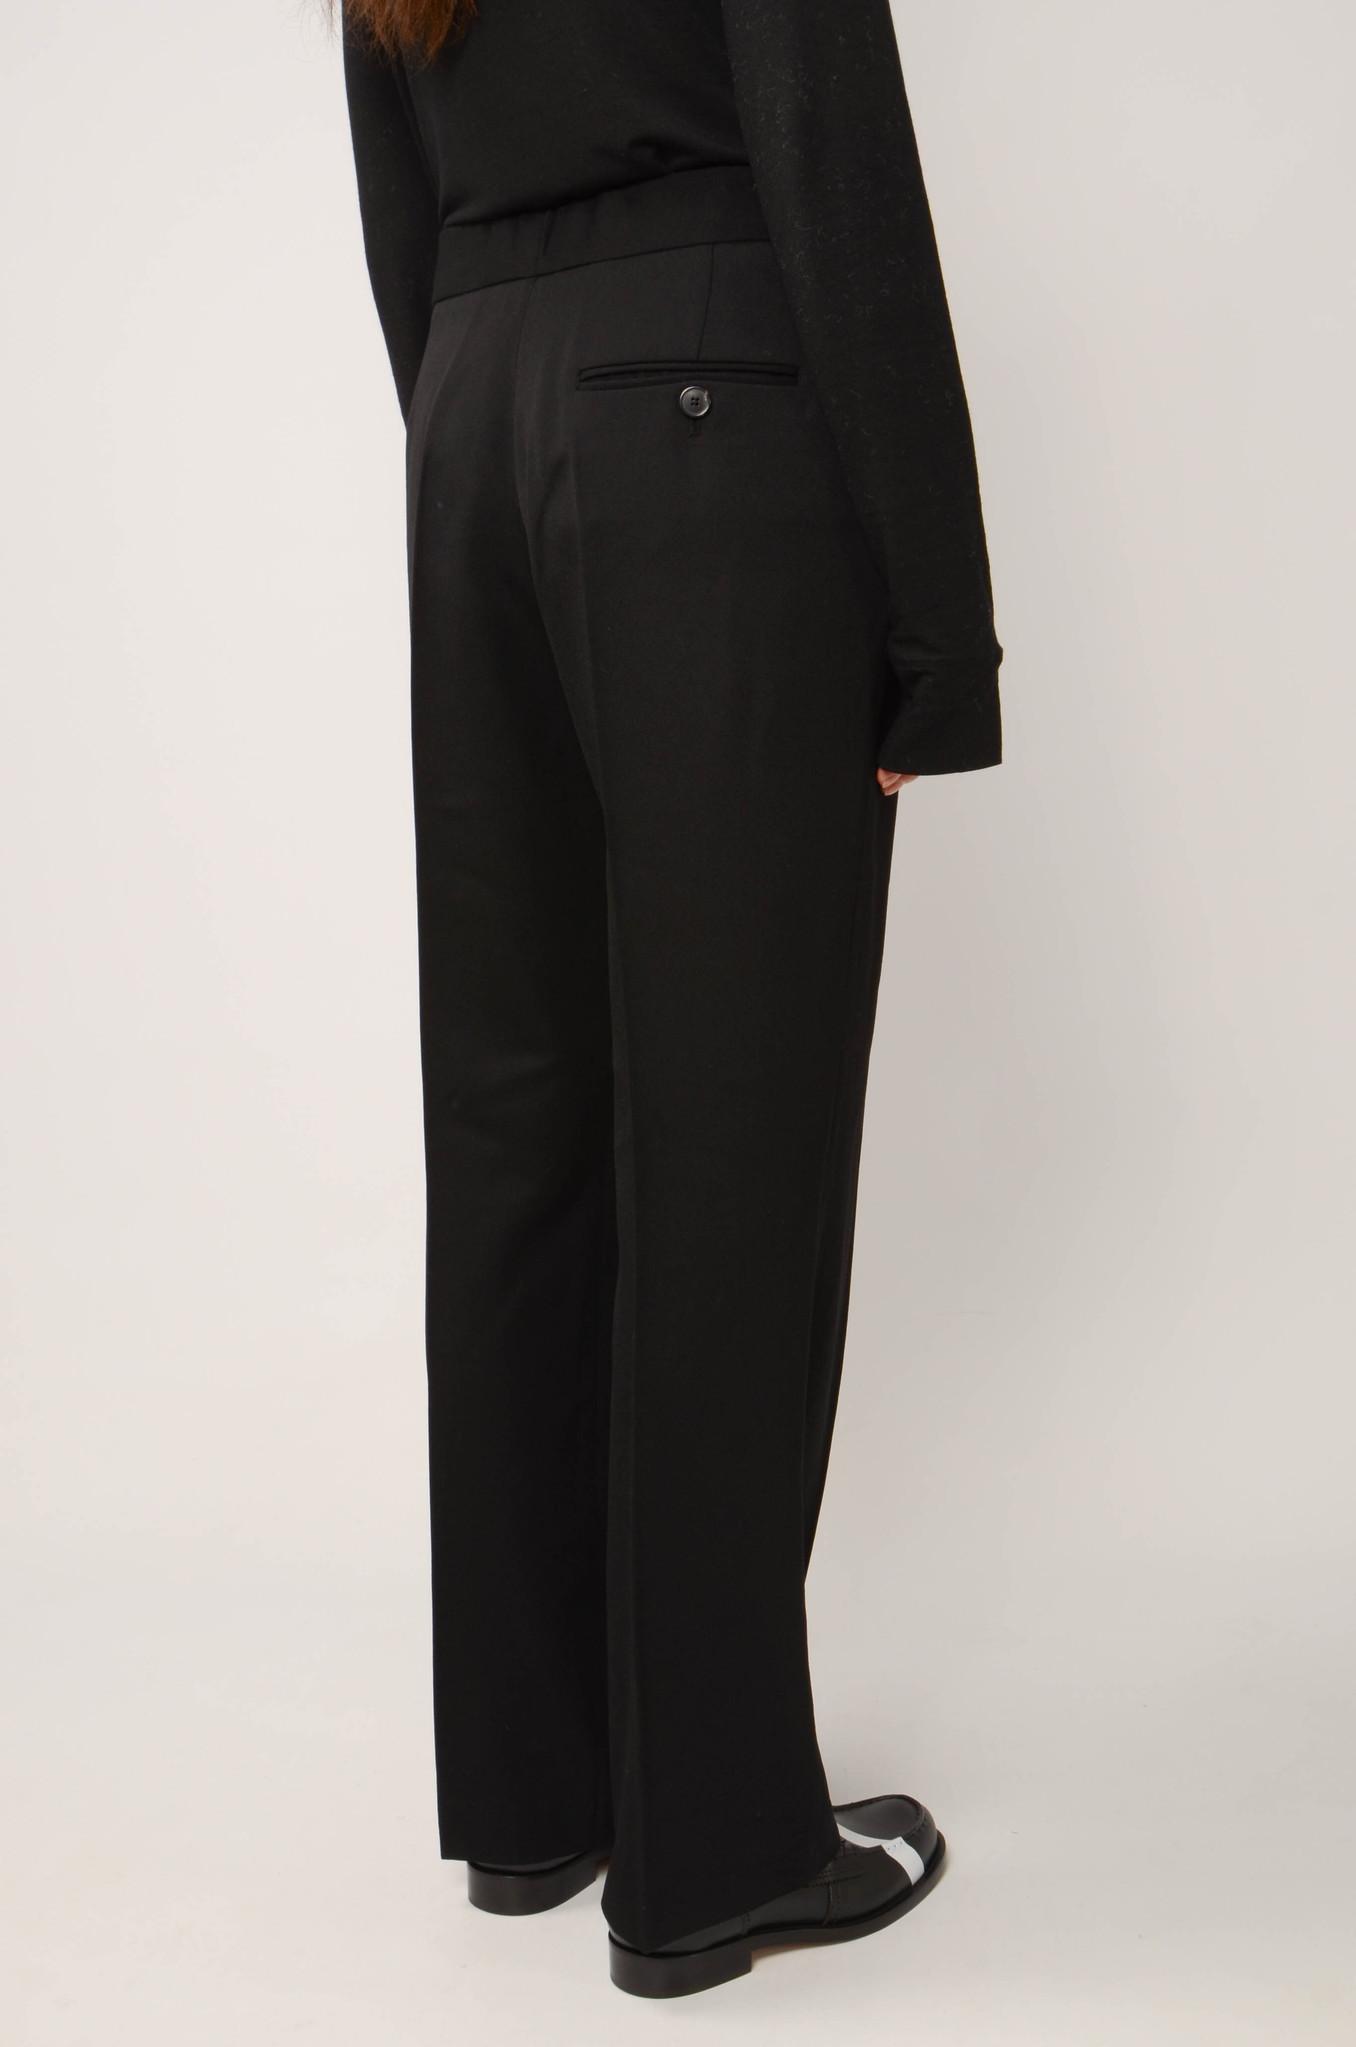 BENTON PANTS IN BLACK-4